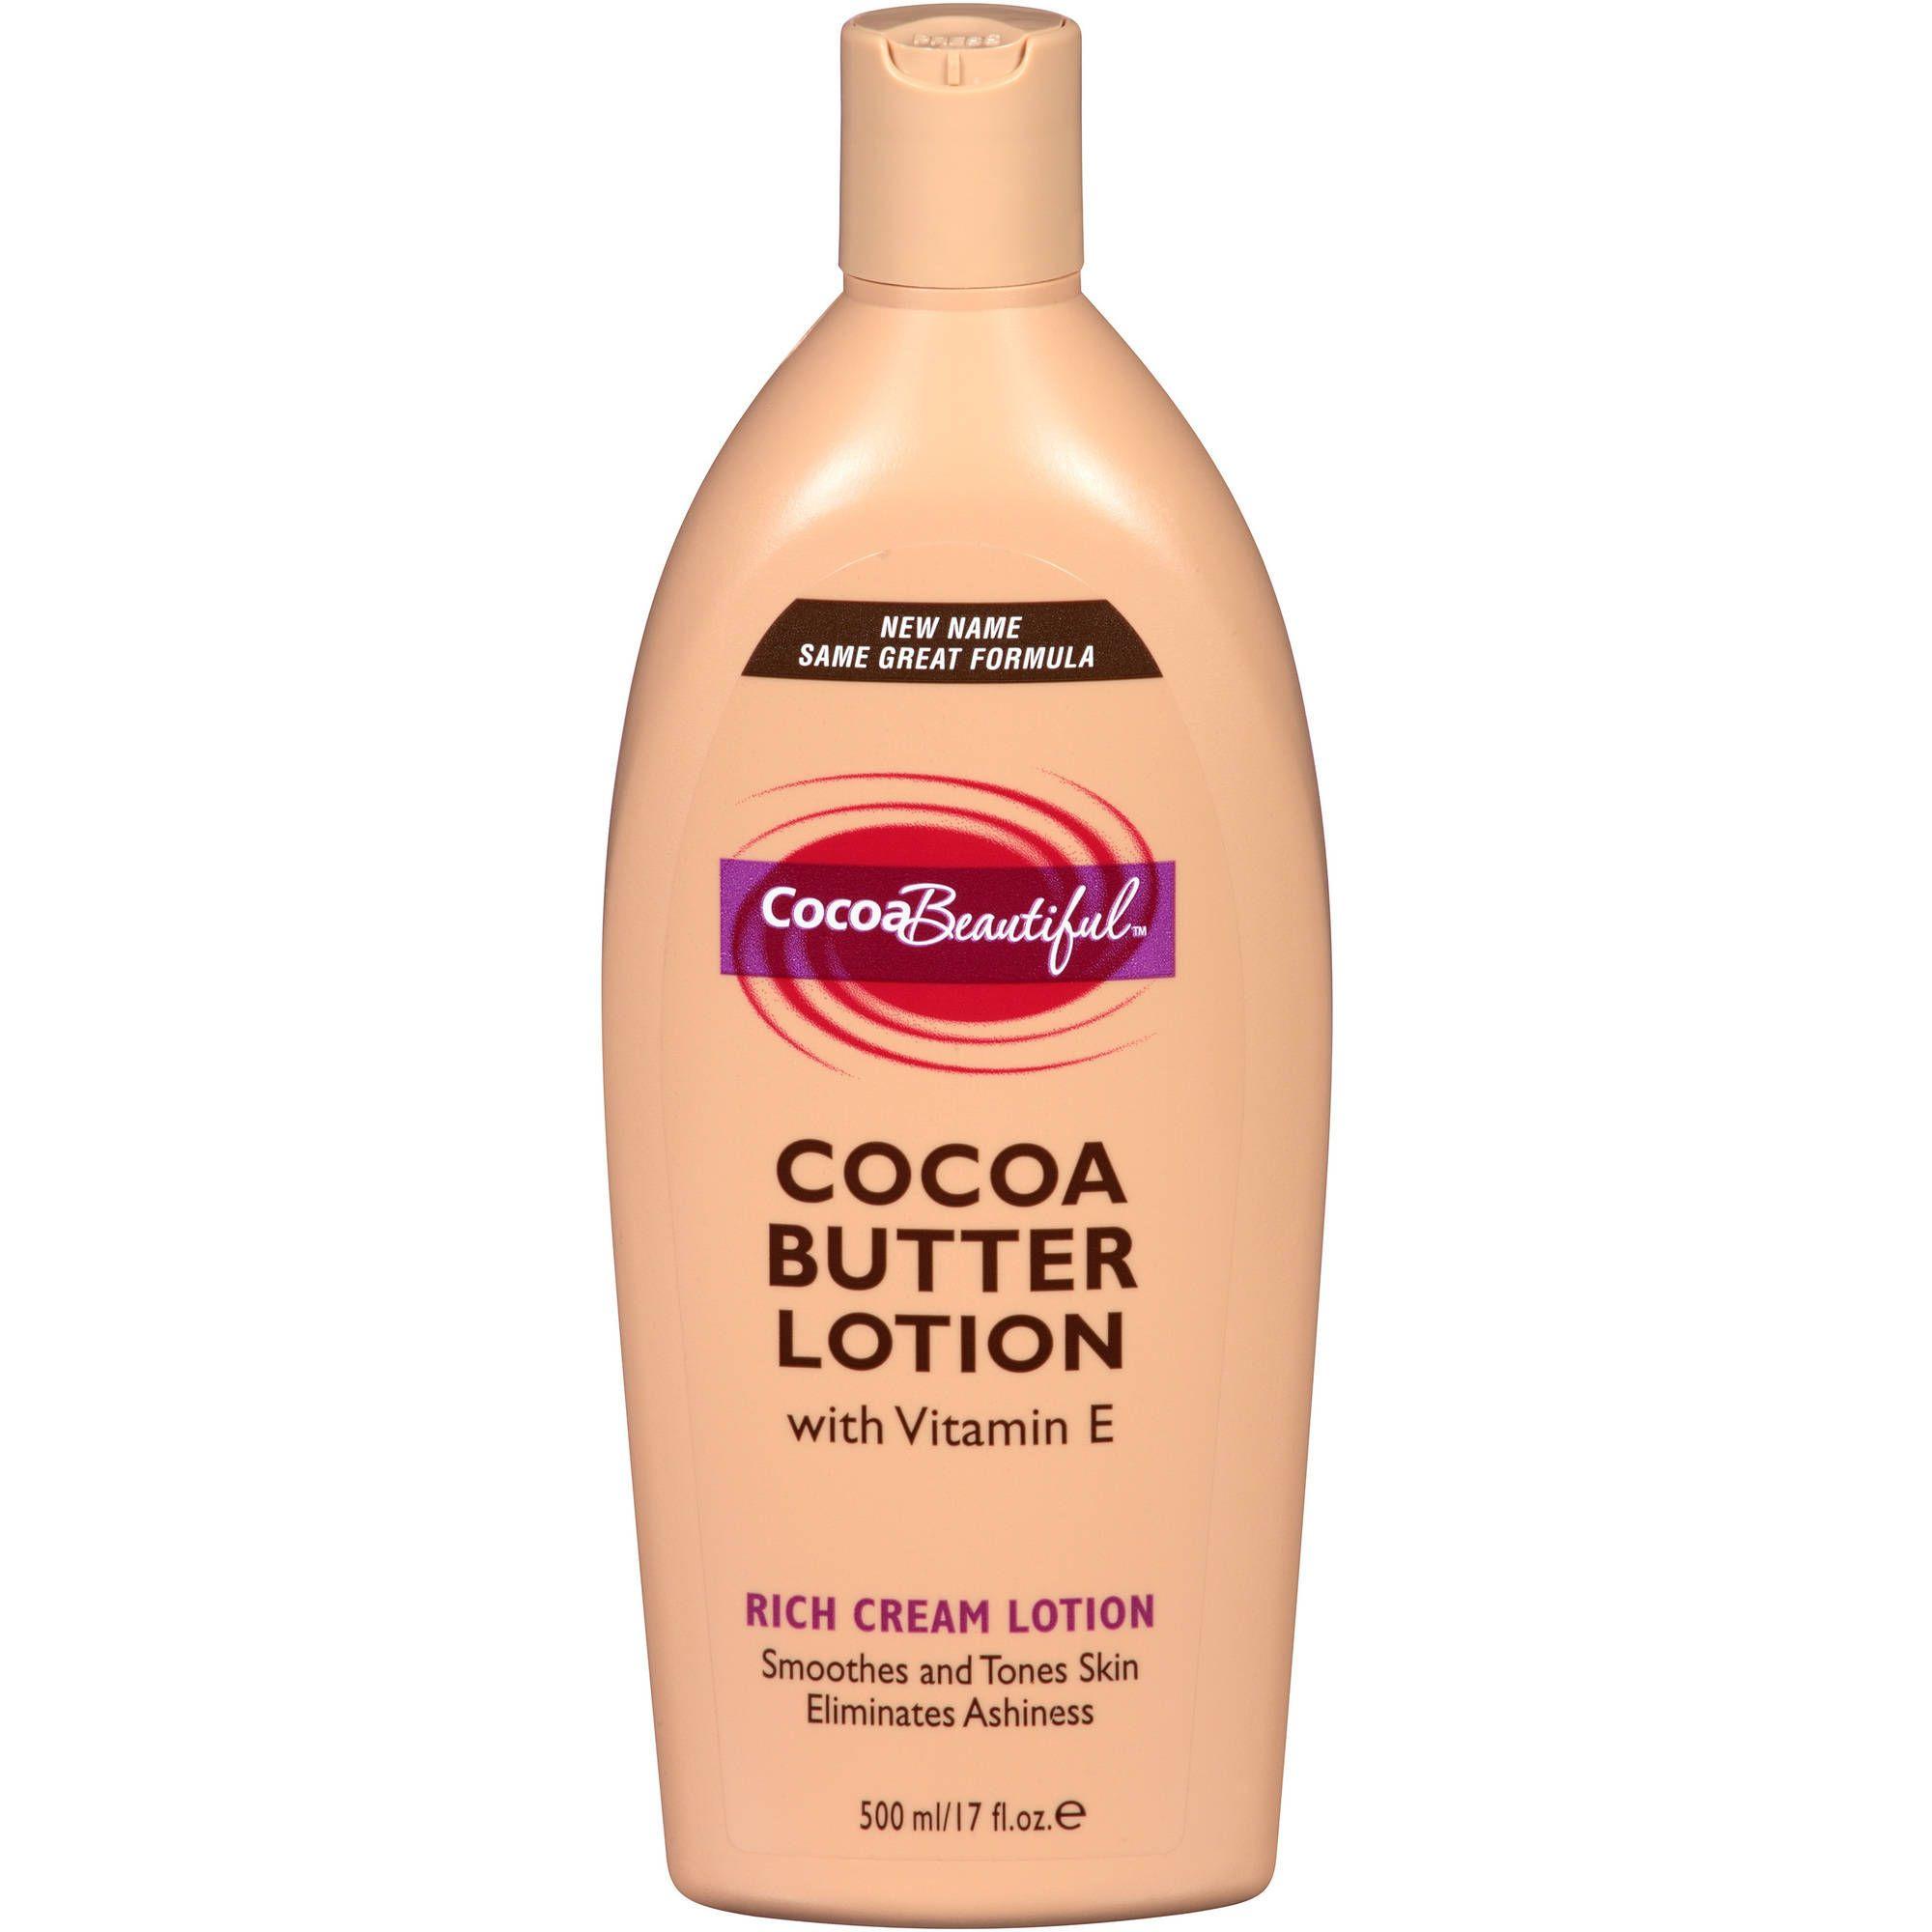 Cocoa Beautiful Cocoa Butter Rich Cream Lotion 17 Fl Oz Walmart Com Cream Lotion Cocoa Butter Lotion Butter Lotion